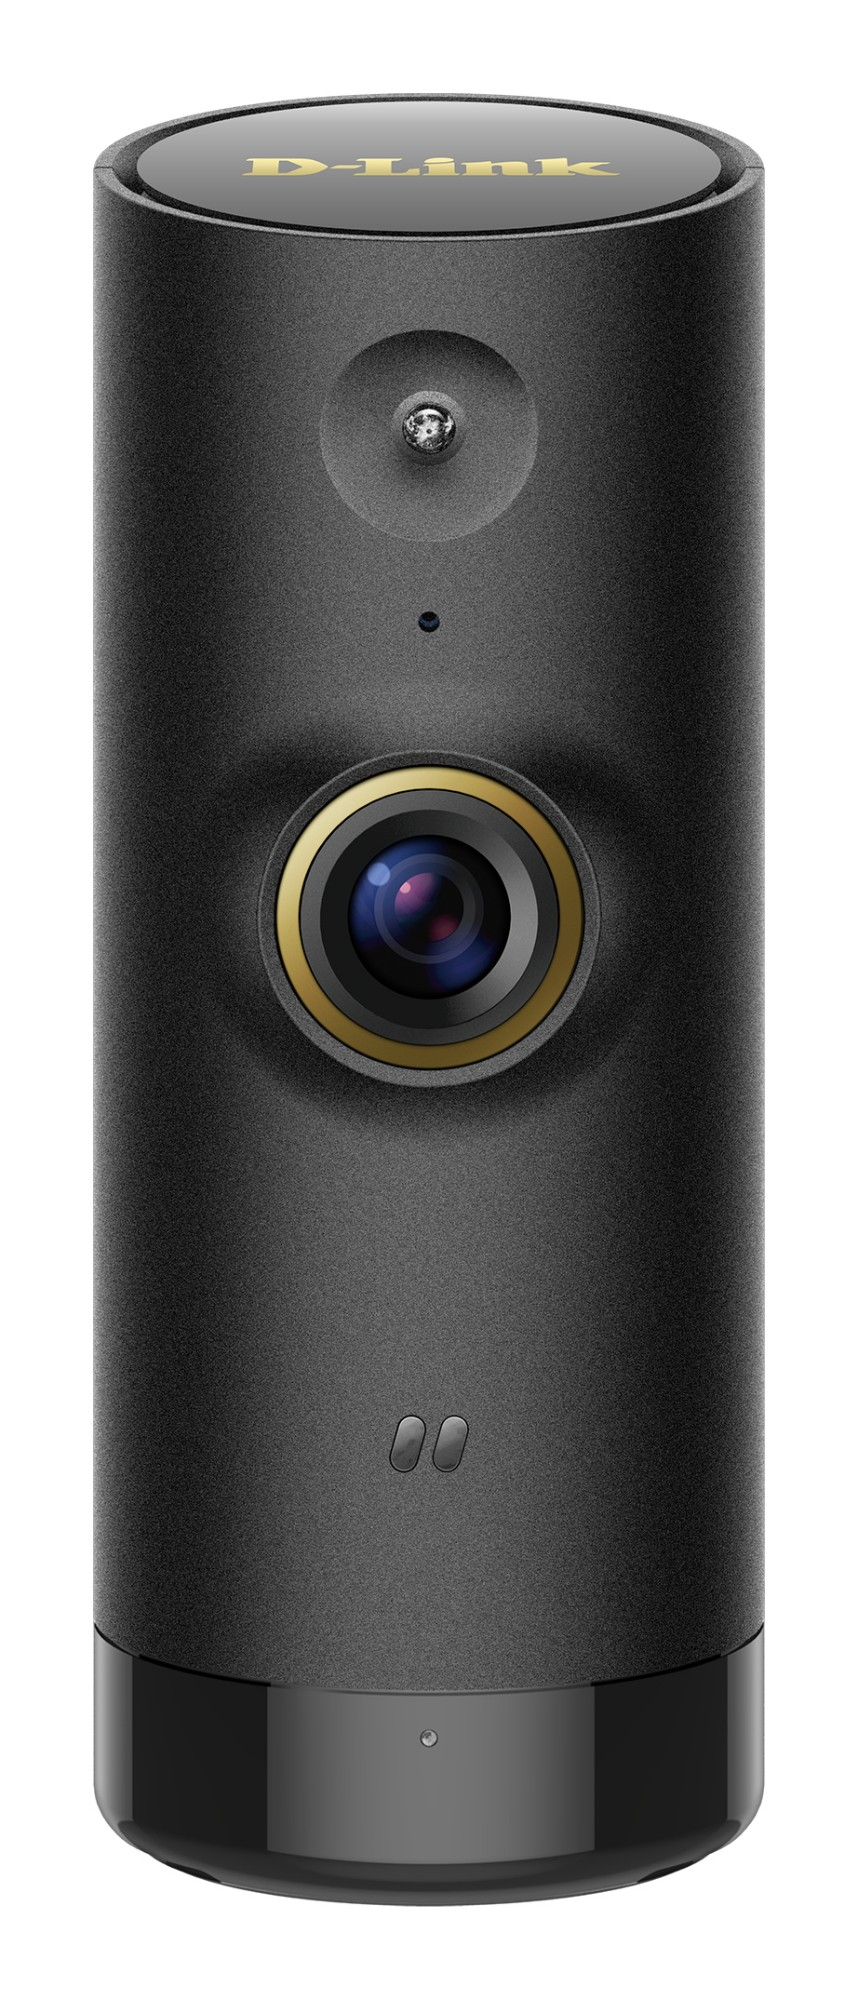 D-Link DCS-P6000LH cámara de vigilancia Cámara de seguridad IP Interior Cubo Piso 1280 x 720 Pixeles